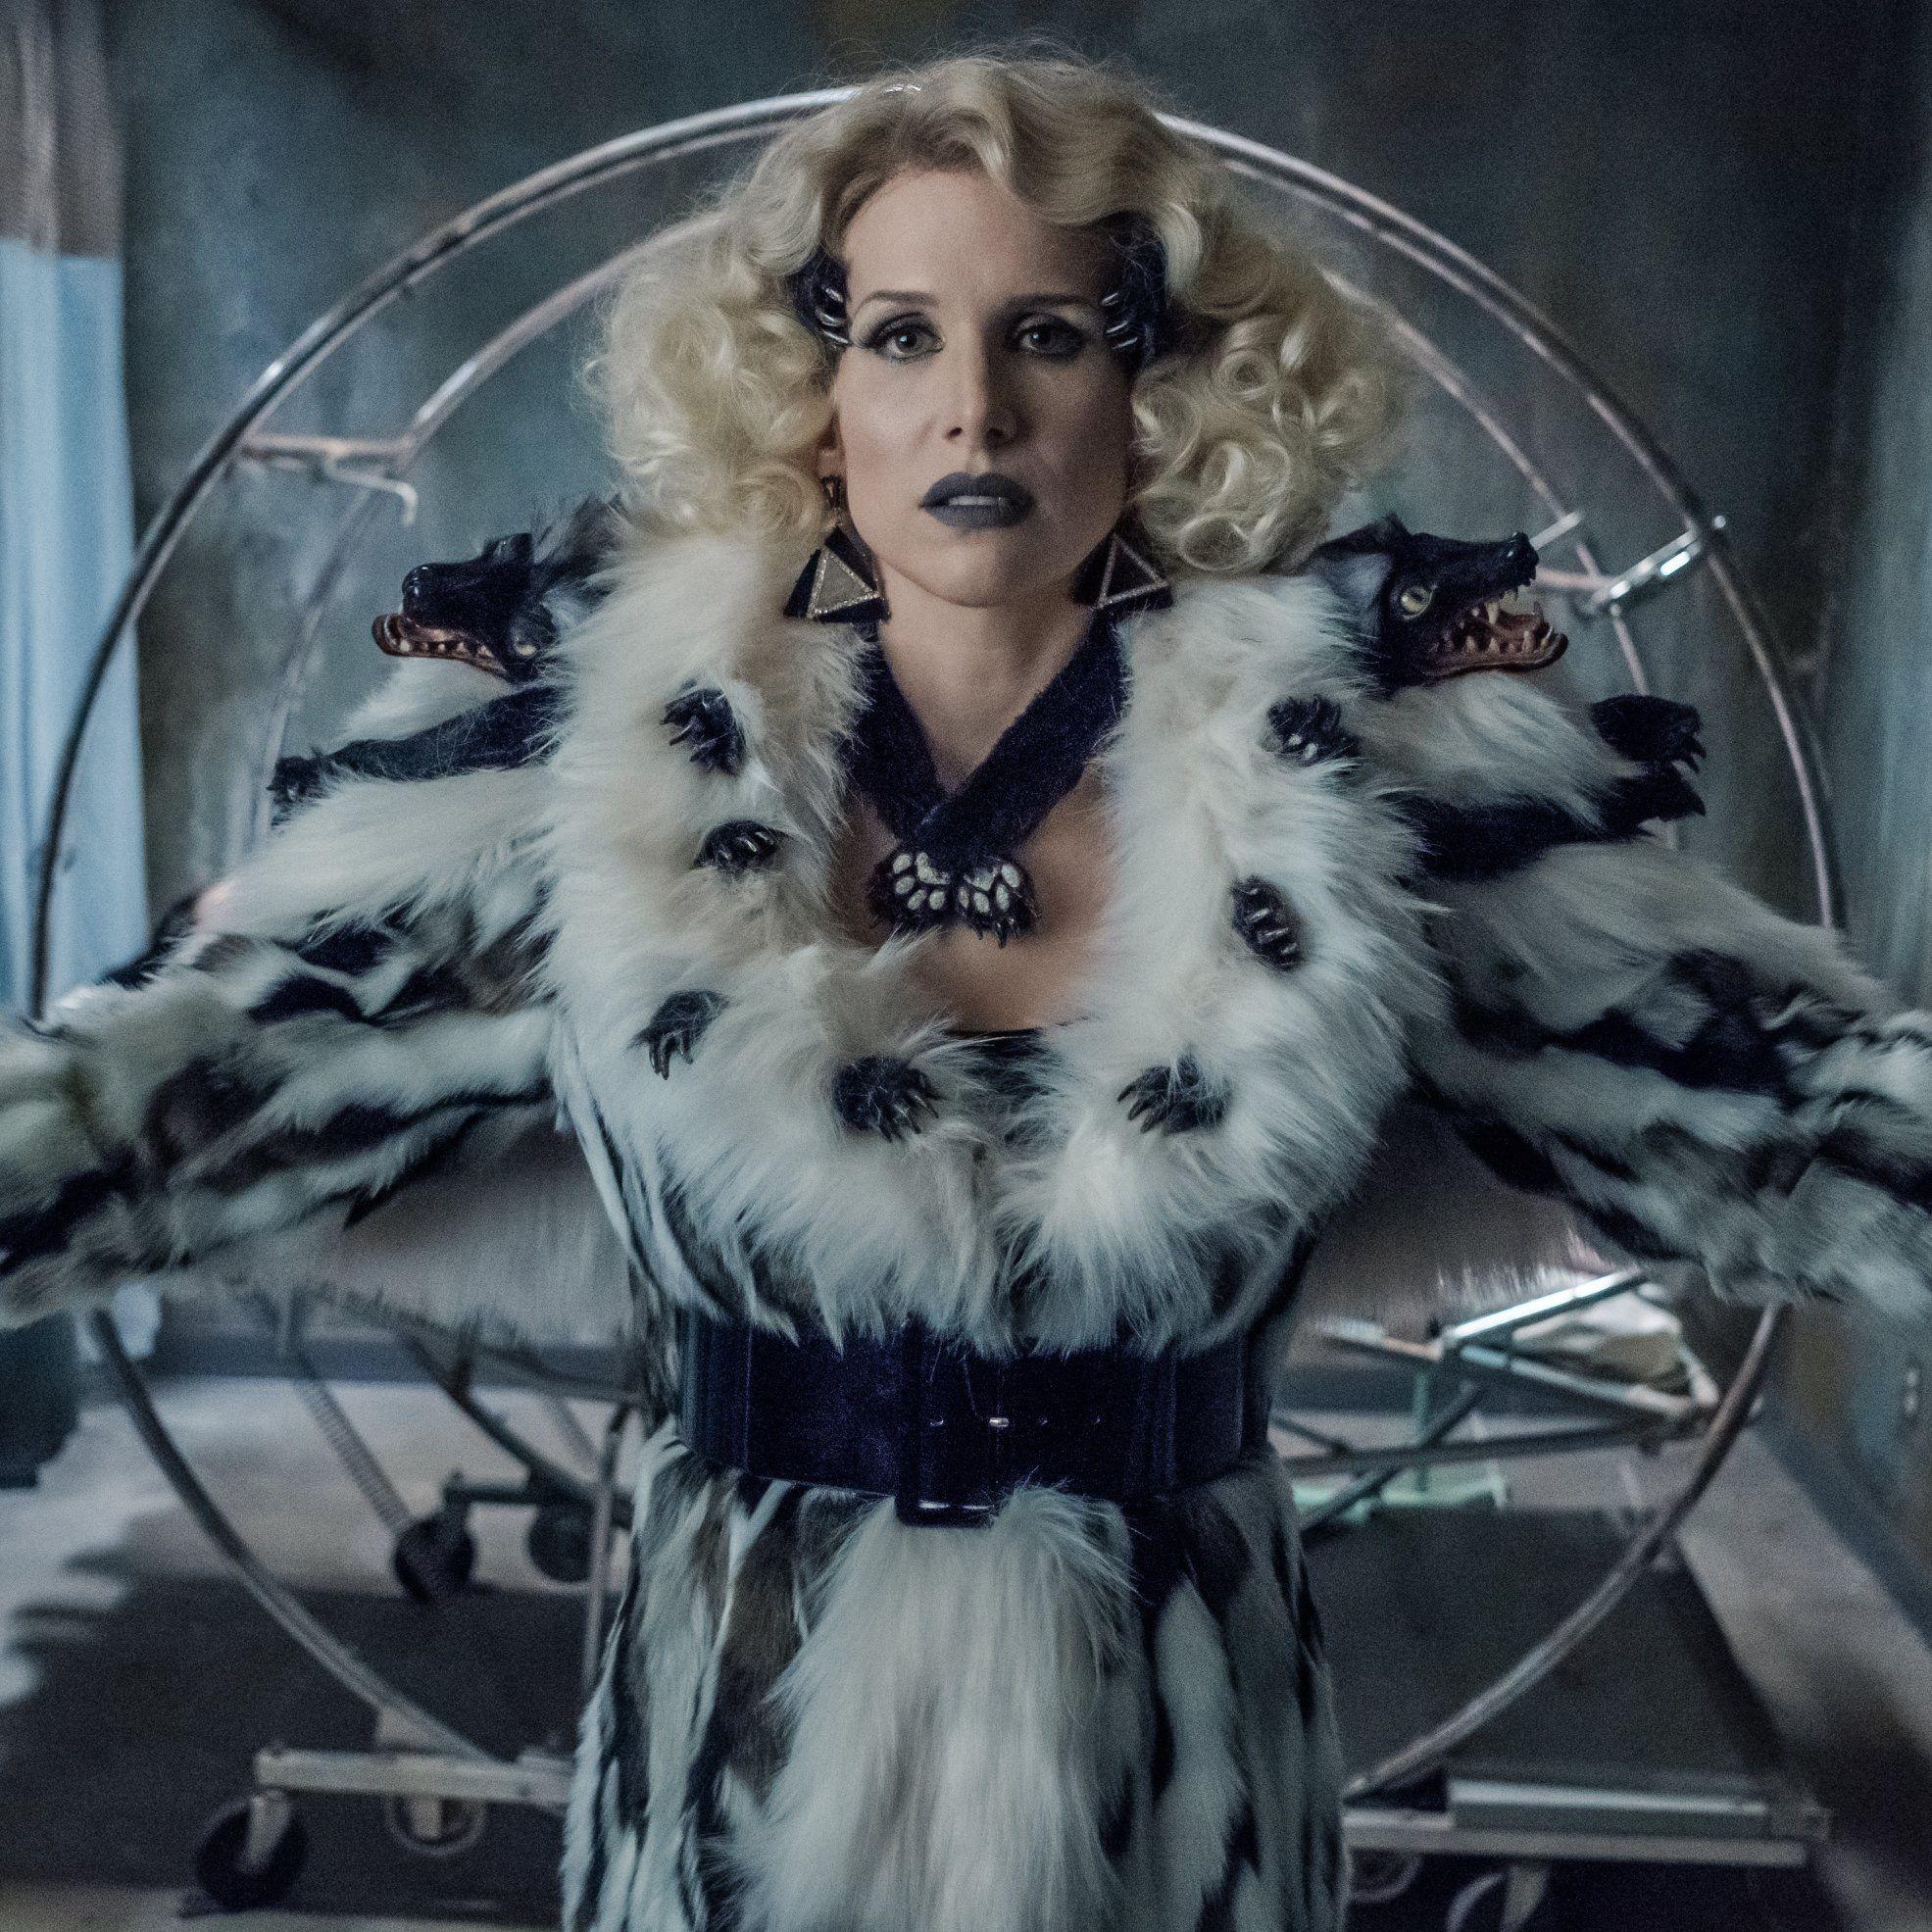 ASoUE Esme Squalor Dressed to kill. Literally. 👠 A